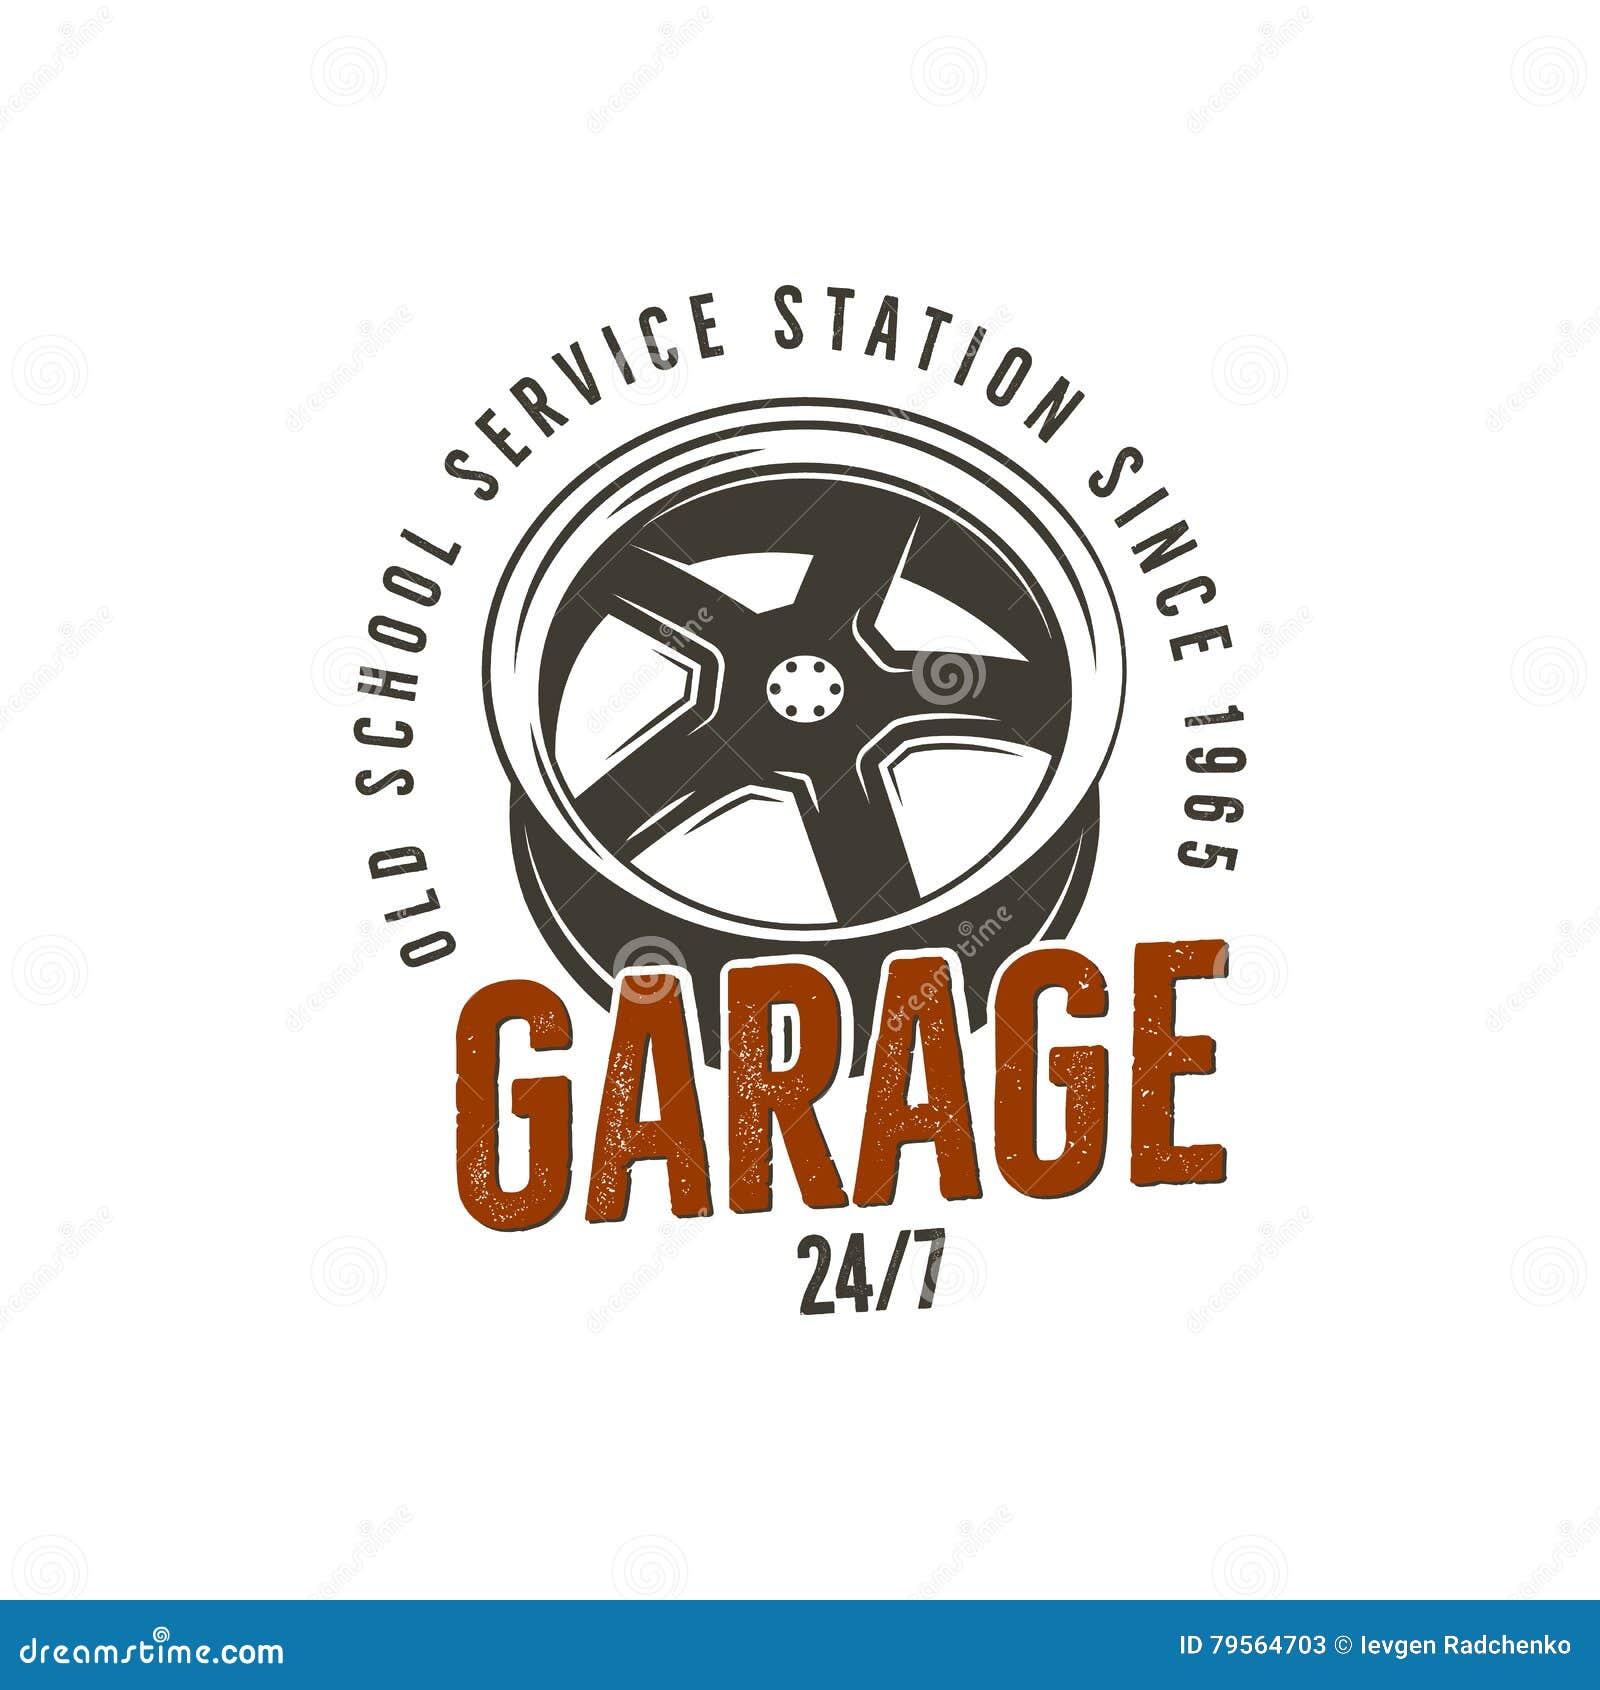 Garage old school service station label. Vintage tee design graphics, complete auto repair typography print. Custom t